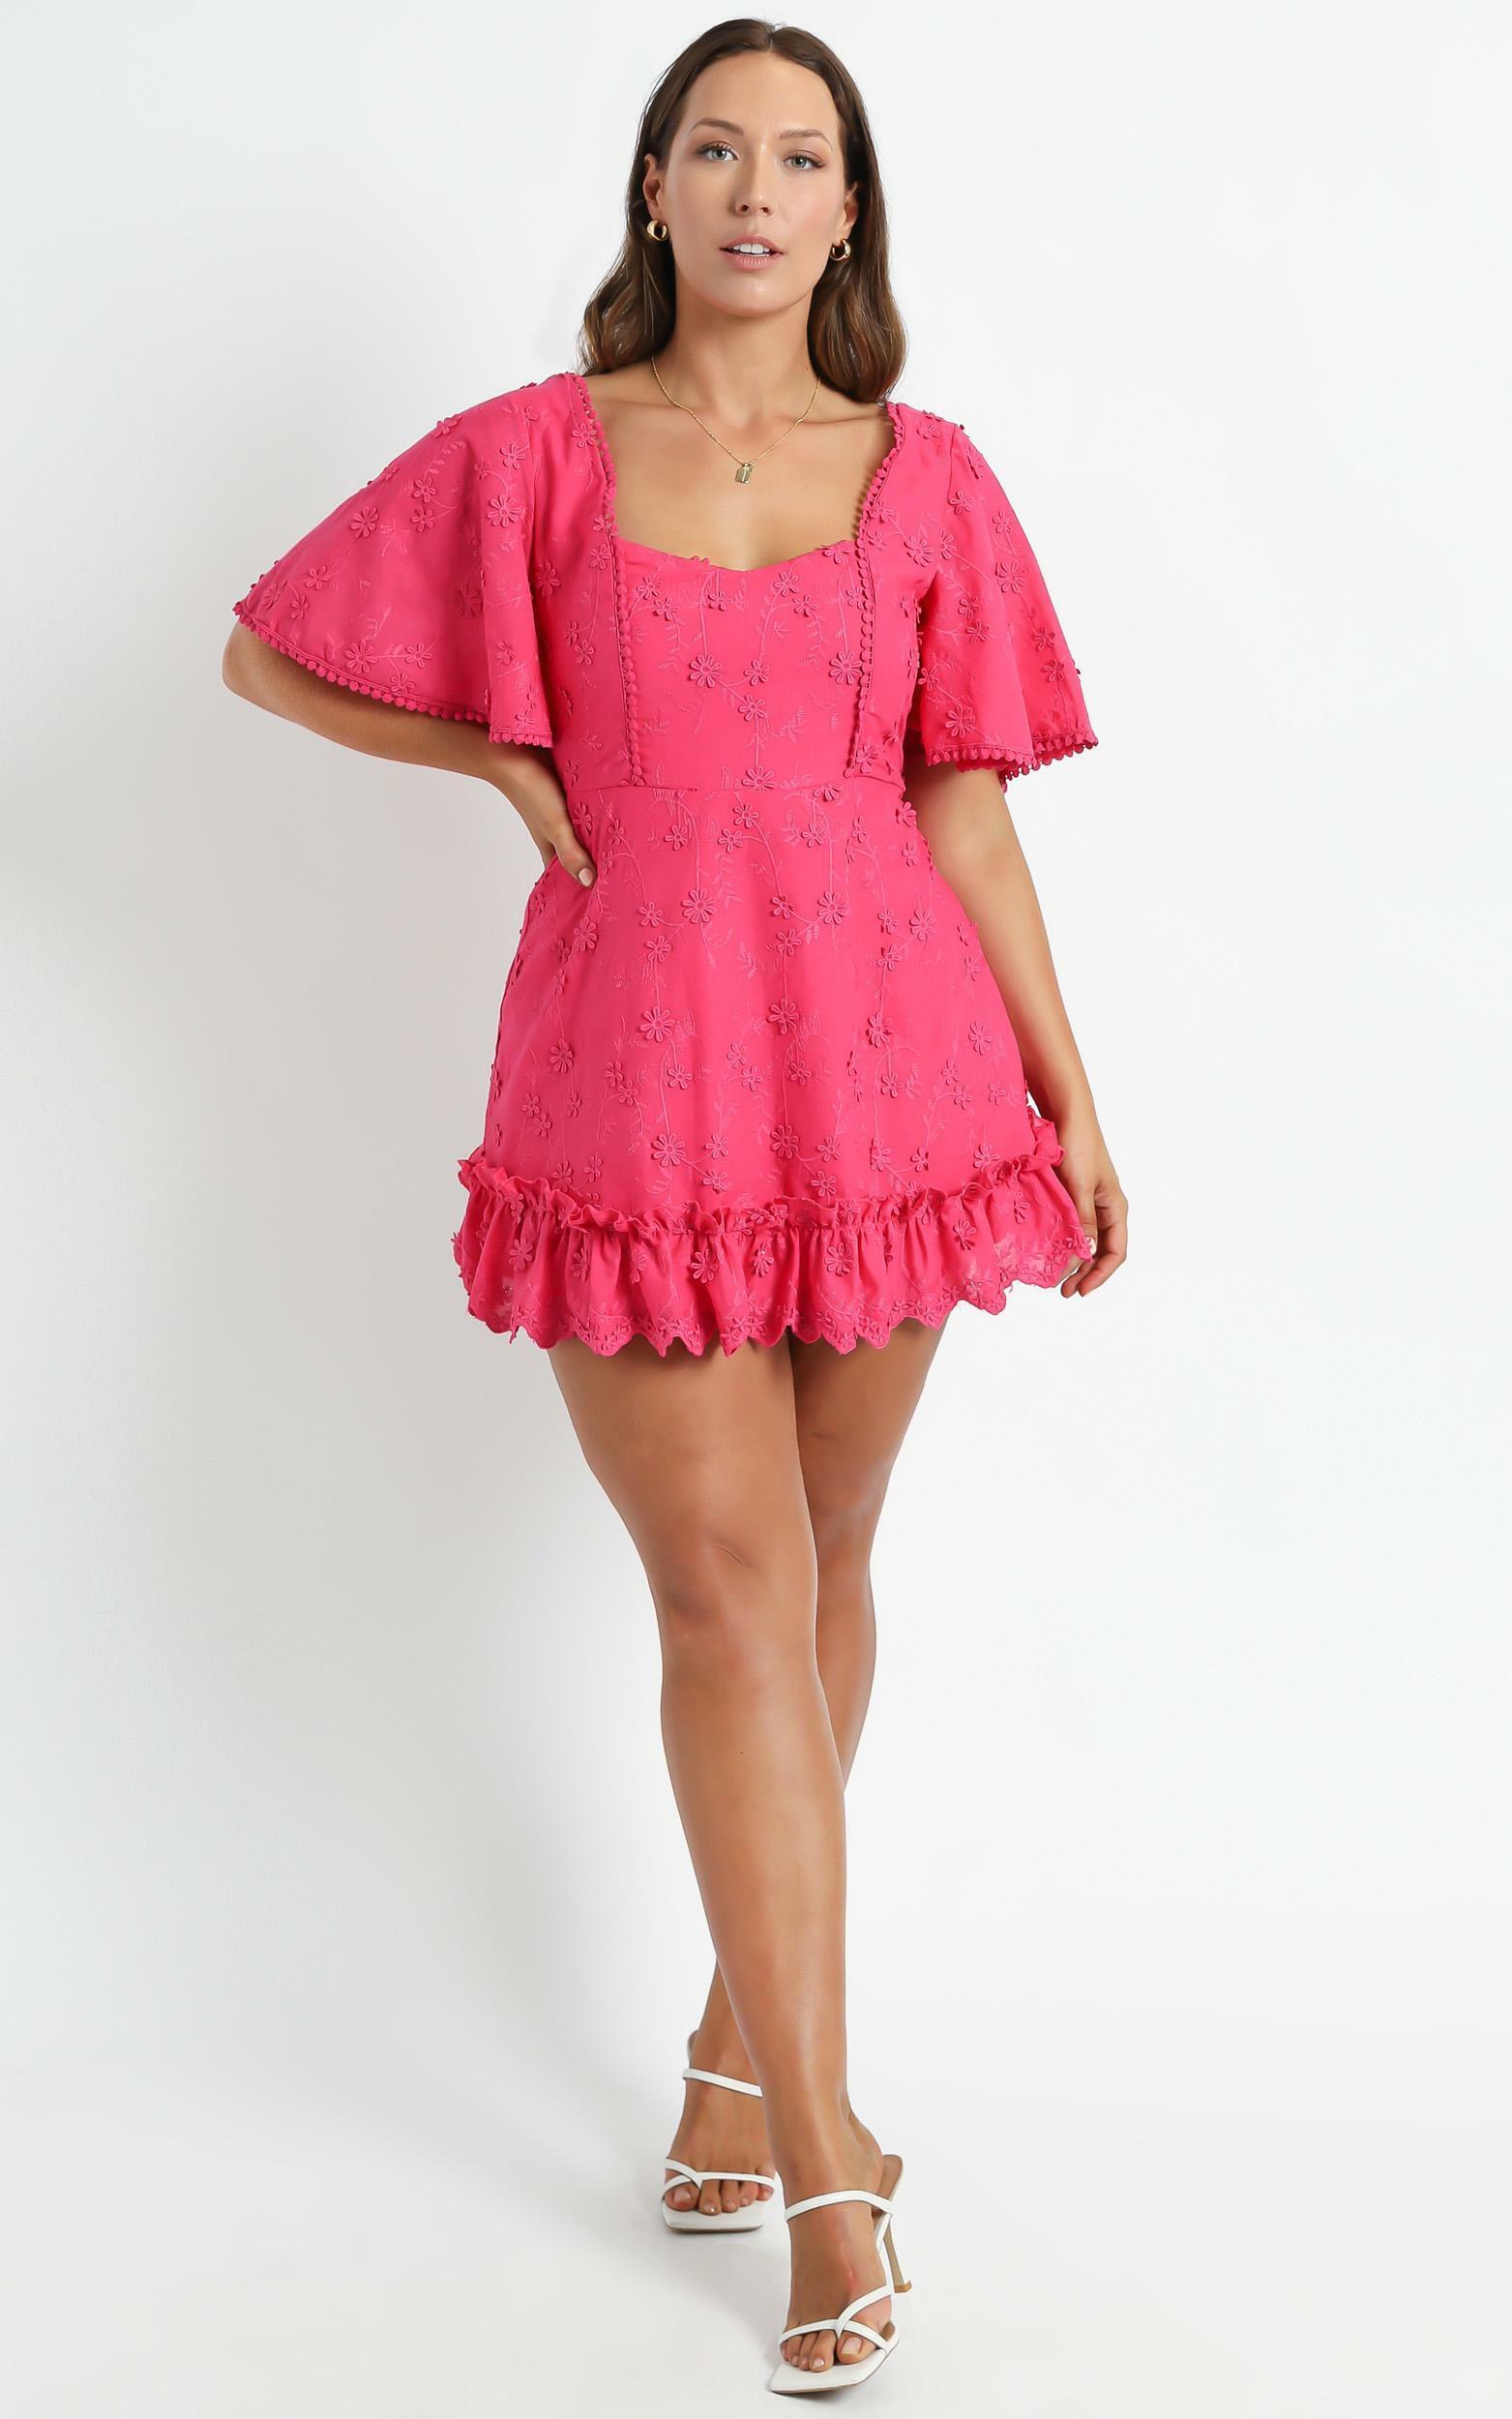 Fancy A Spritz Dress in Hot Pink - 04, PNK3, hi-res image number null